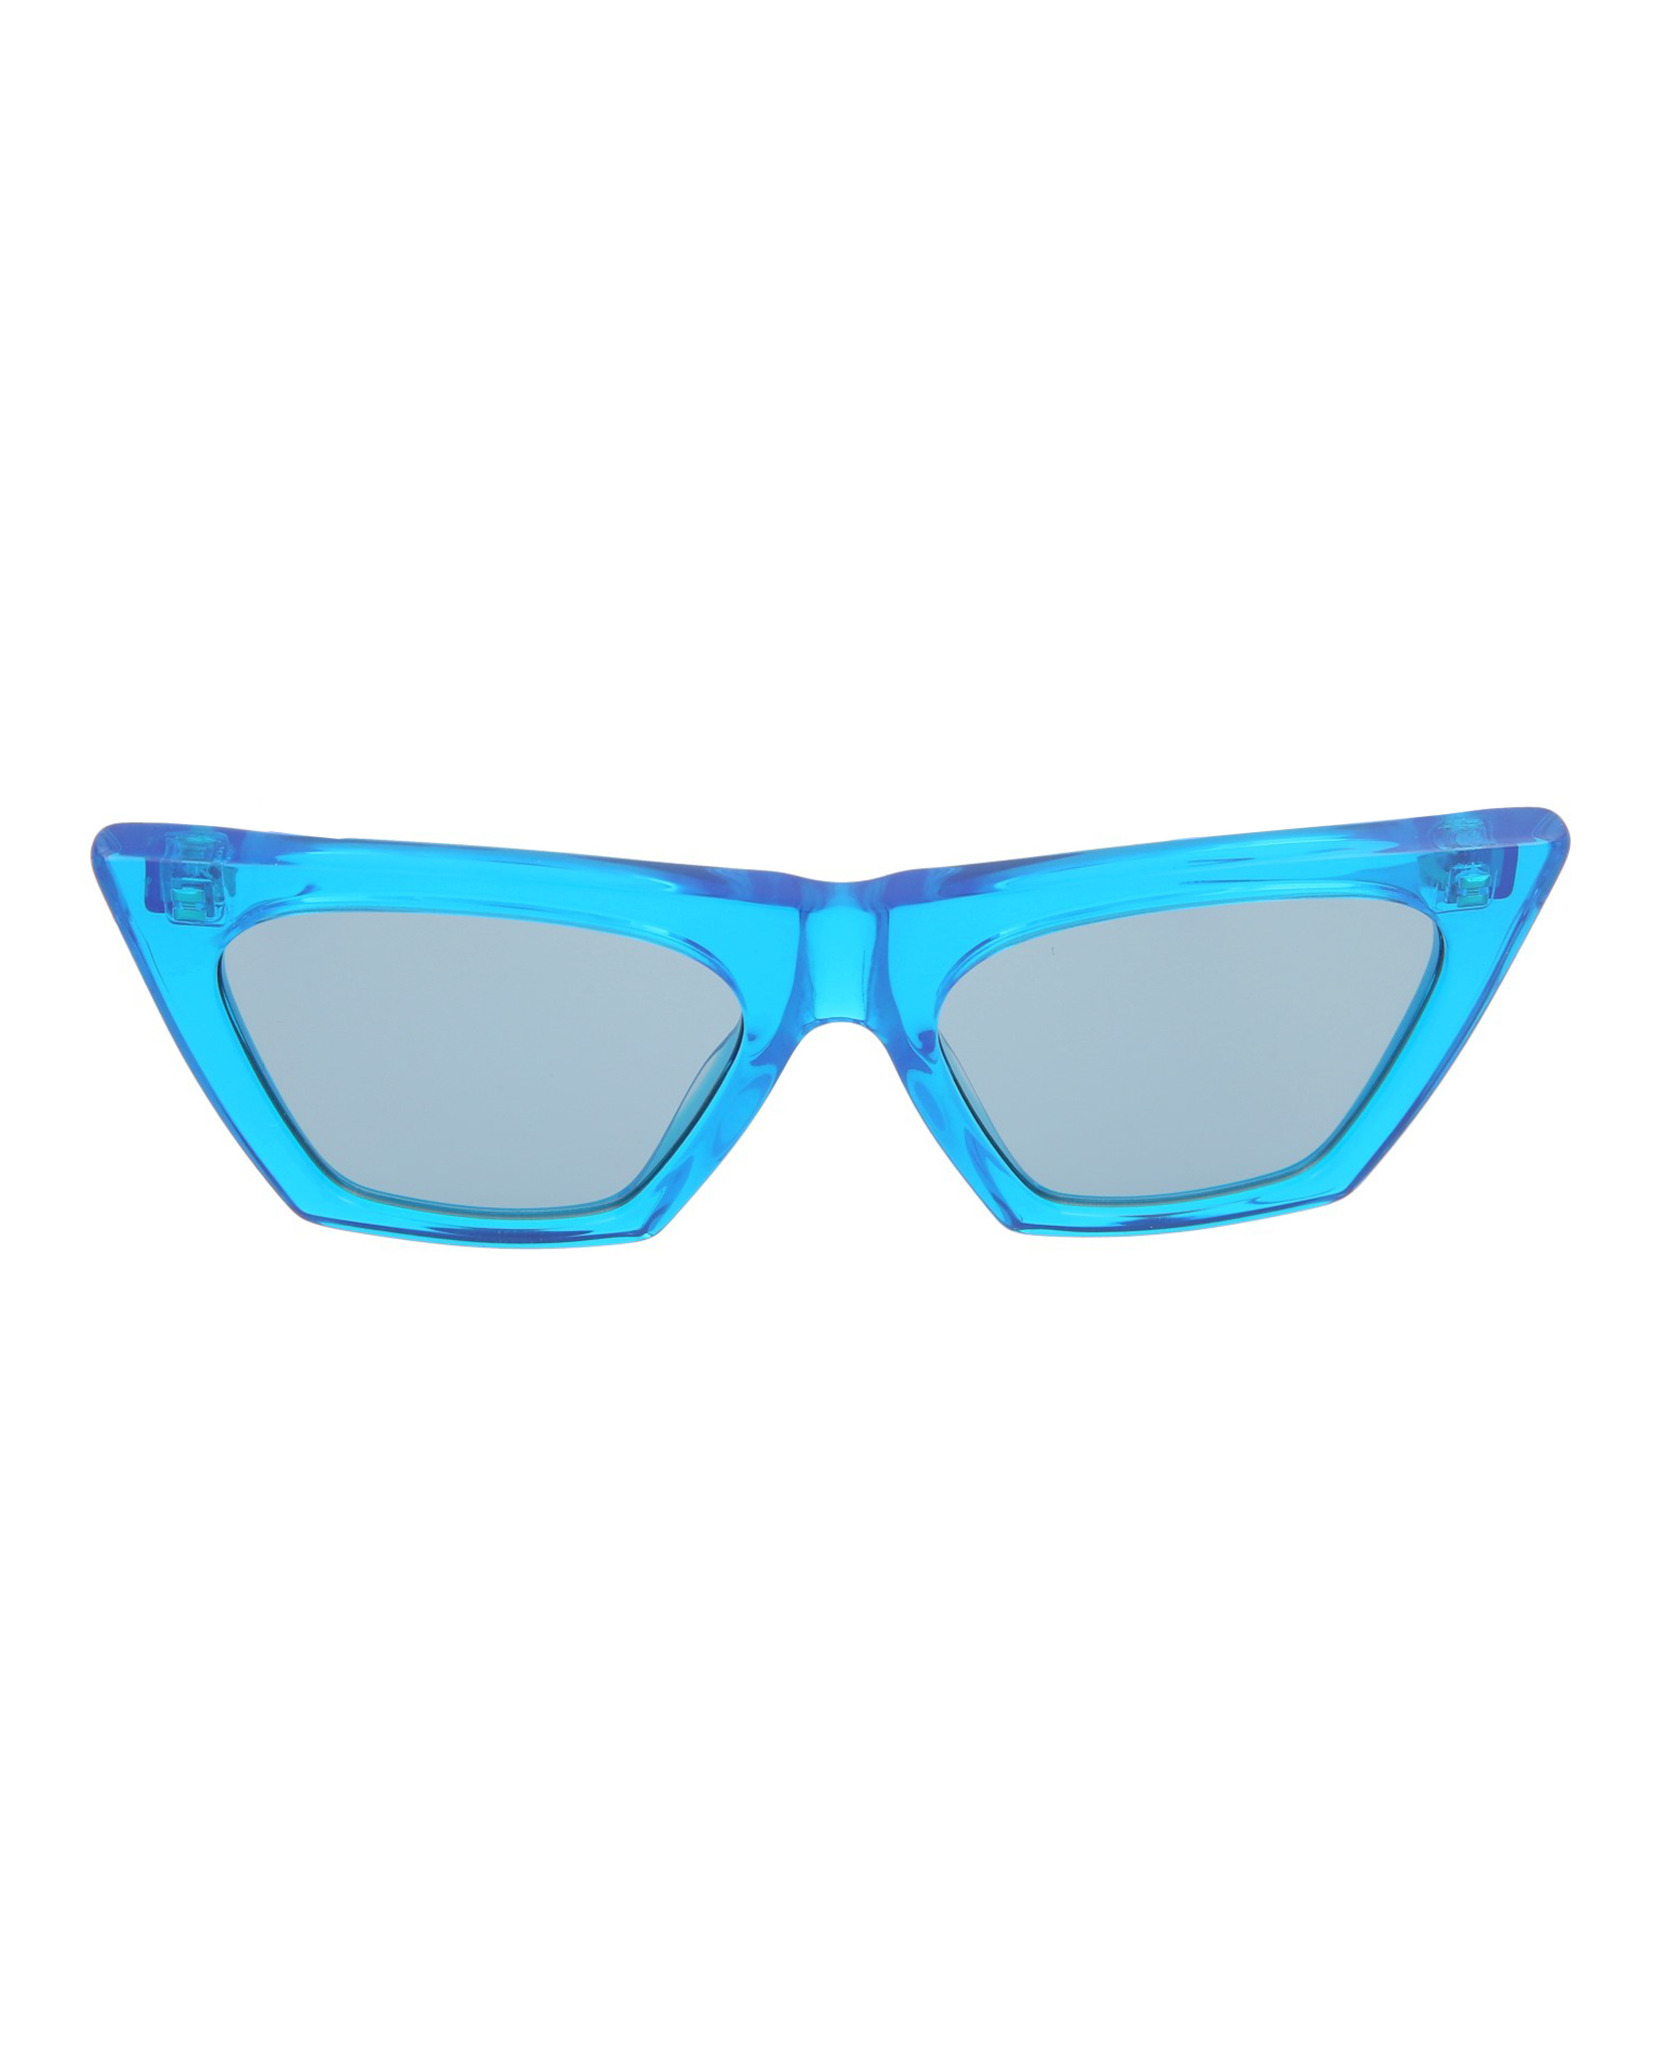 c3ac27623d4 Celine Womens Square Rectangle Sunglasses CL41468S-200486GEG-51KU